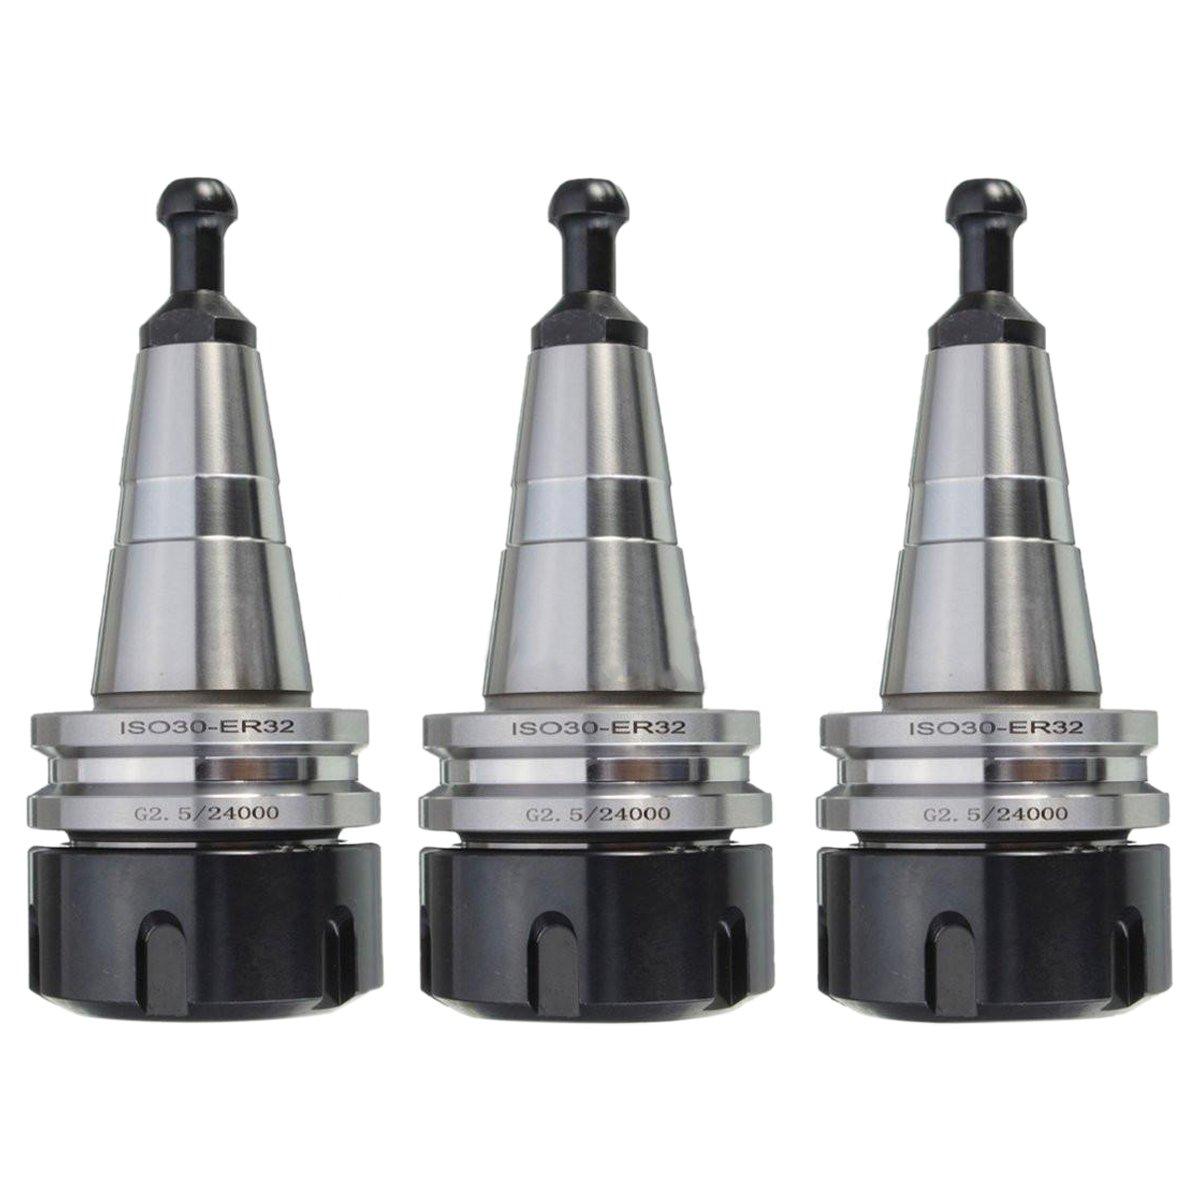 SODIAL 3PCS metal ISO30 ER32 50 Balance Collet Chuck G2.5 24000rpm CNC Toolholder